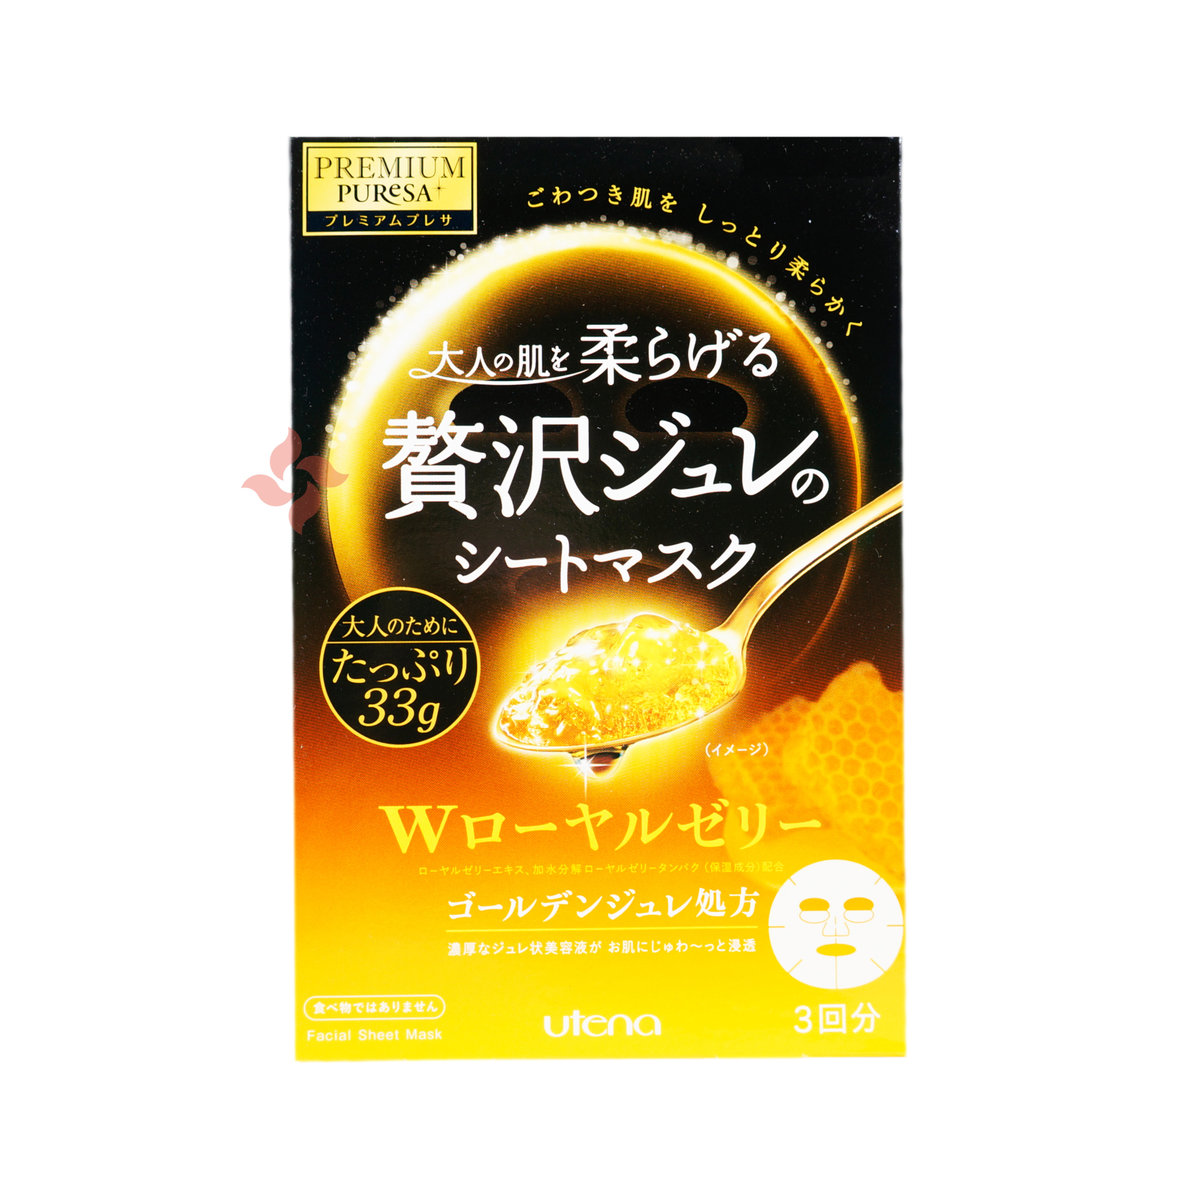 Utena Premium Puresa 佑天娜 普麗莎 黃金果凍面膜( 蜂王漿) 33g (1盒3片)  金黃色(4901234299719)